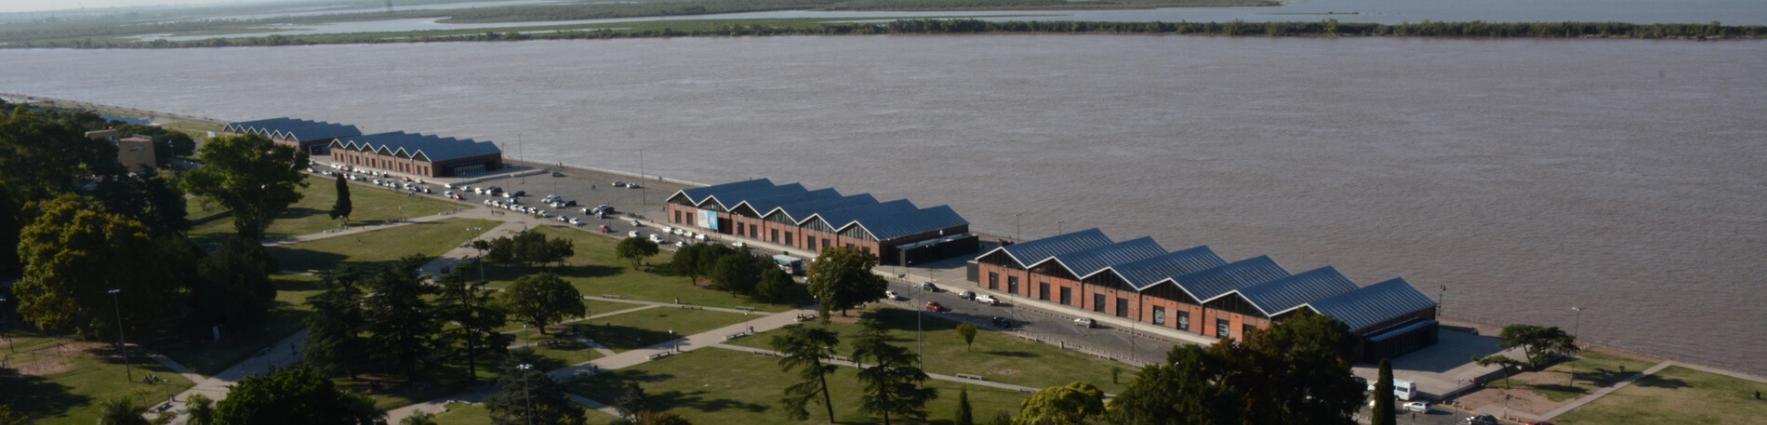 Vista aérea de la franja del río